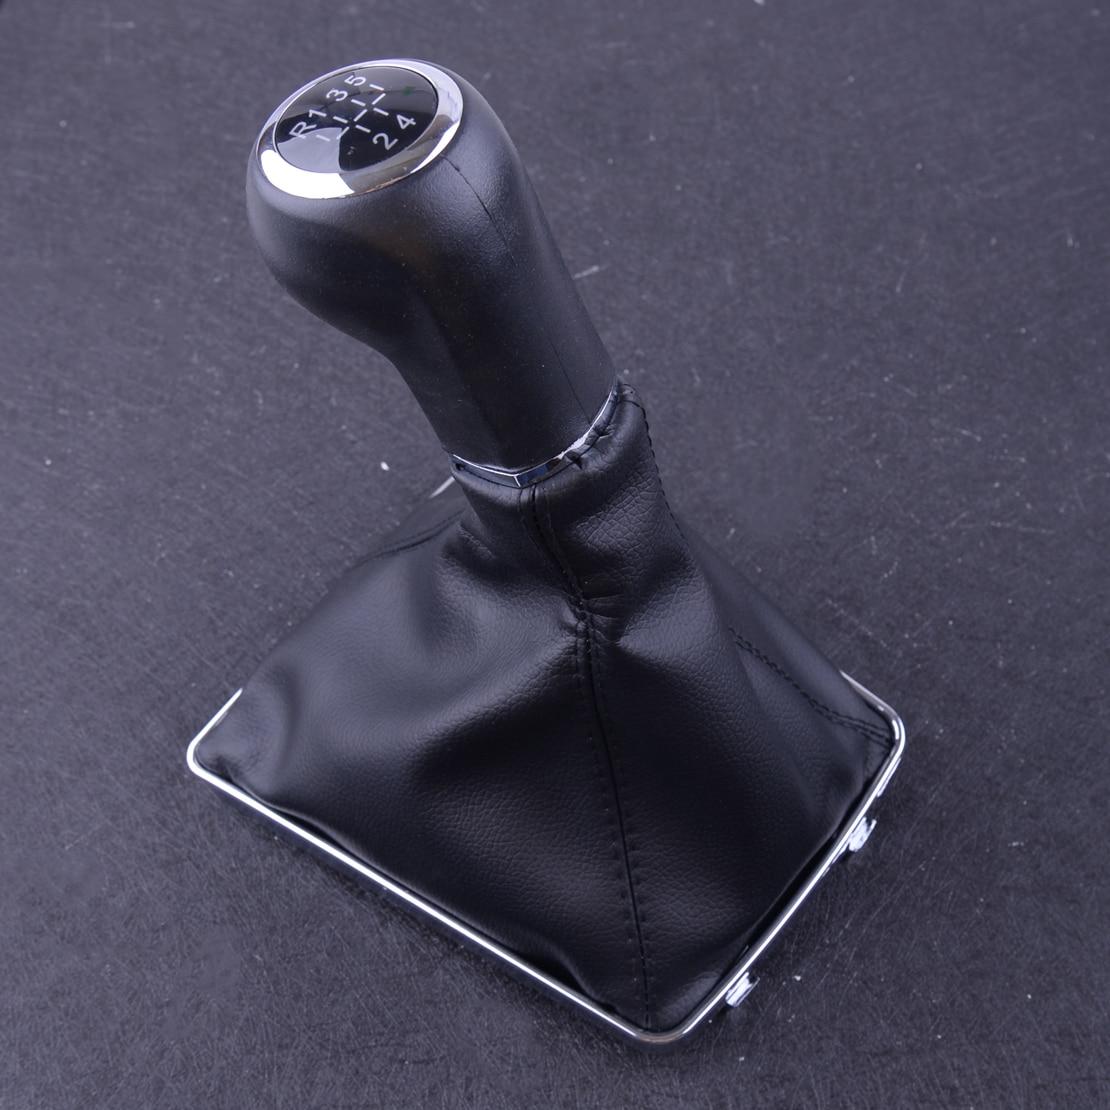 Black Leather Stitch Manual Automobile 5-Speed Gear Stick Shift Knob j Kit Trim